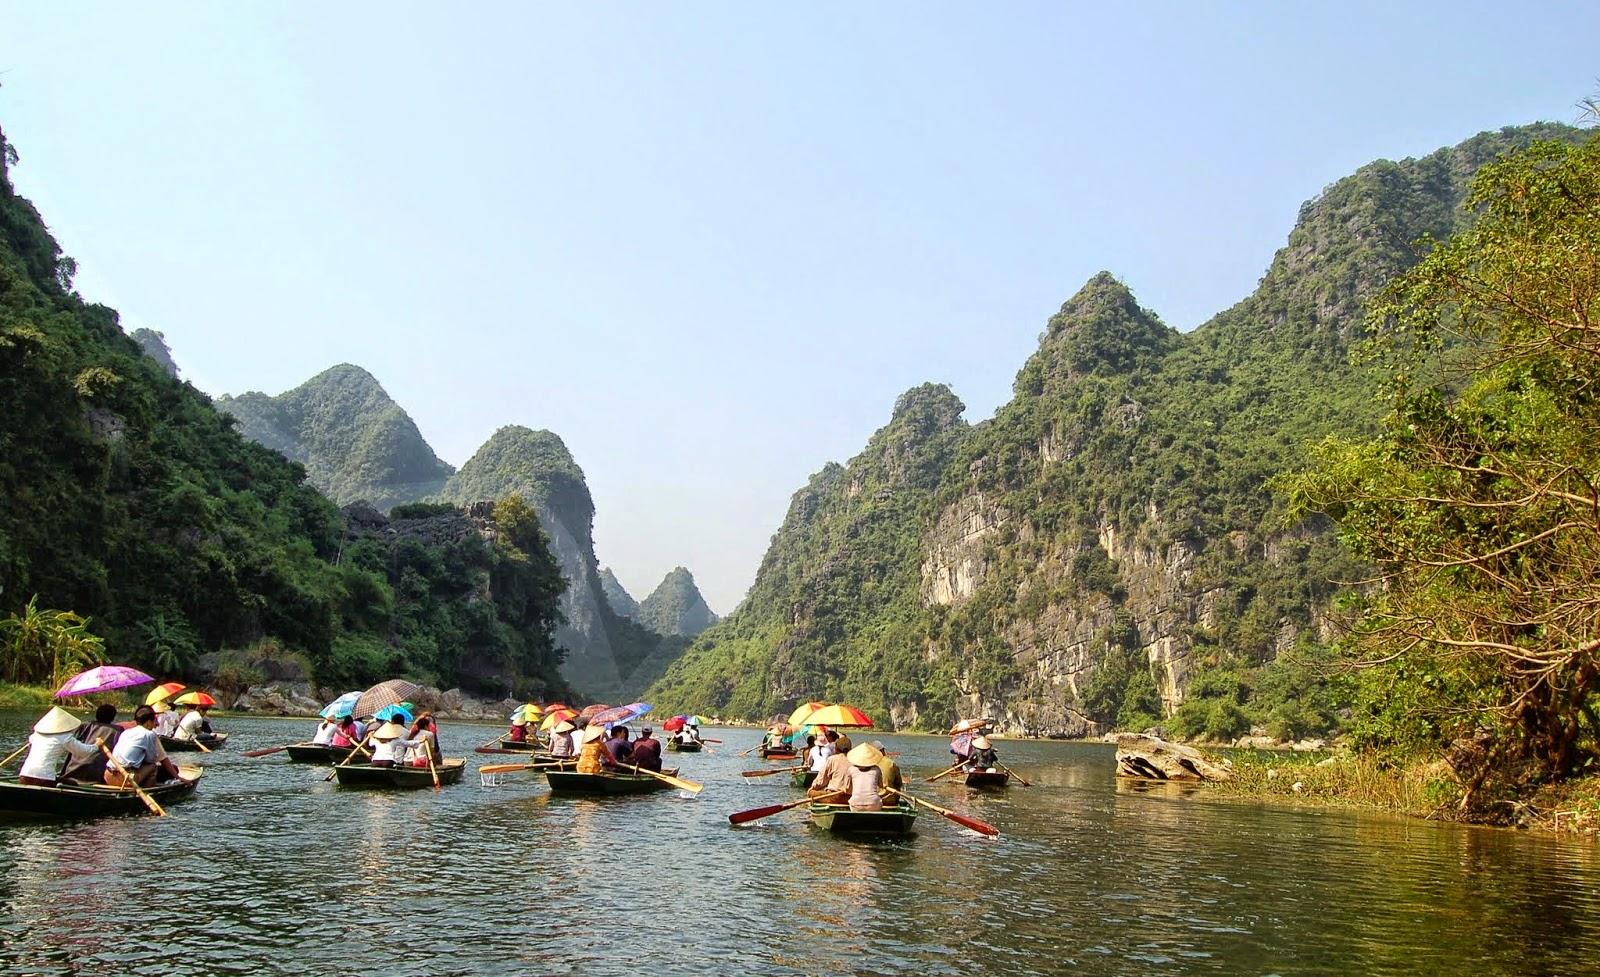 Four best features of Trang An Landscape Complex